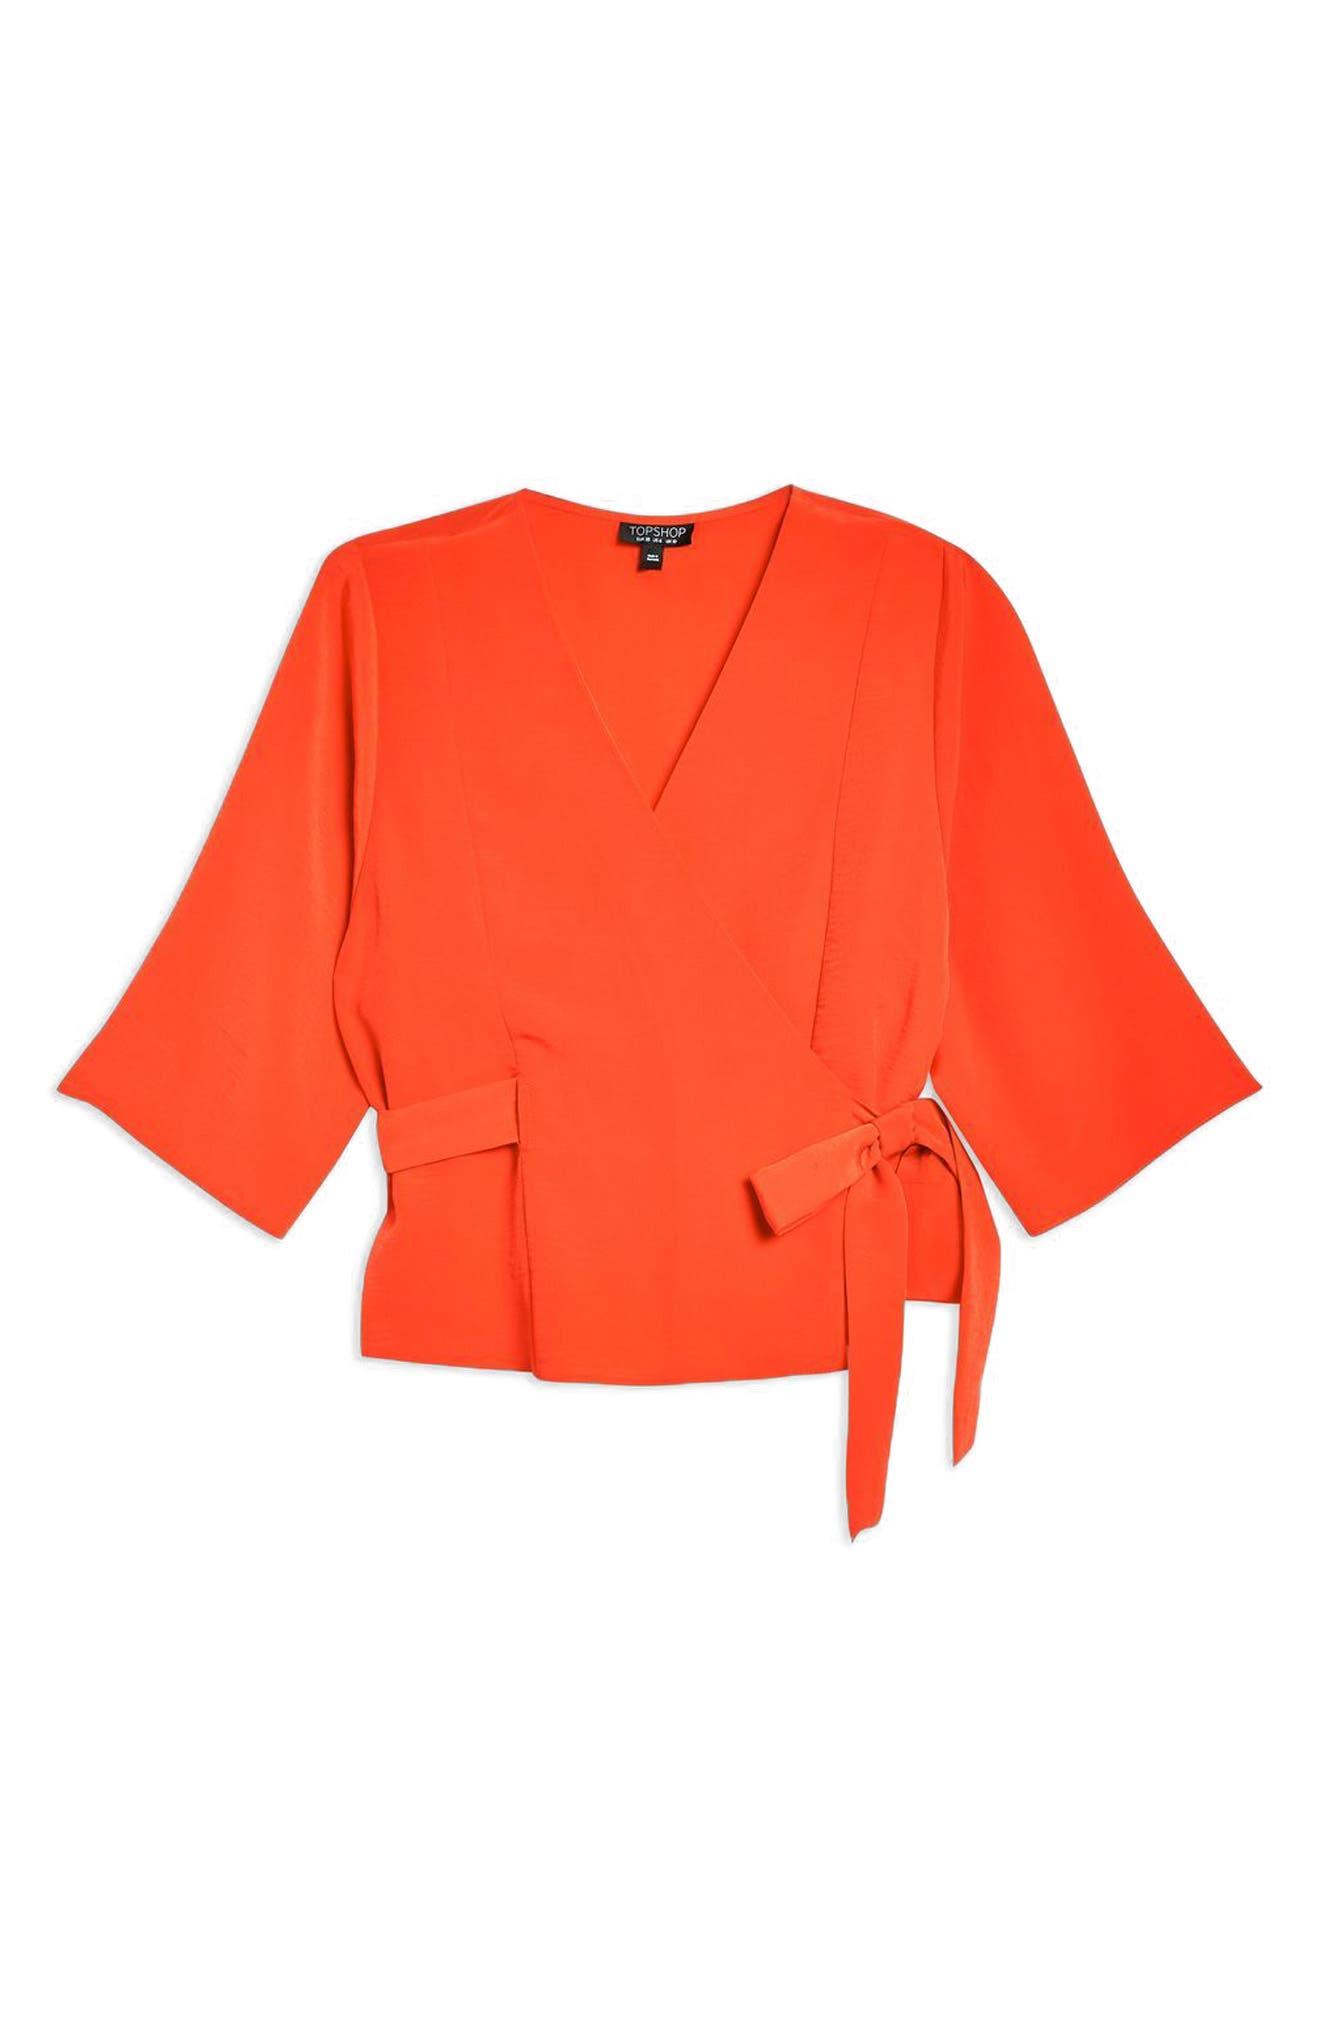 Kimono Wrap Blouse,                             Alternate thumbnail 3, color,                             600